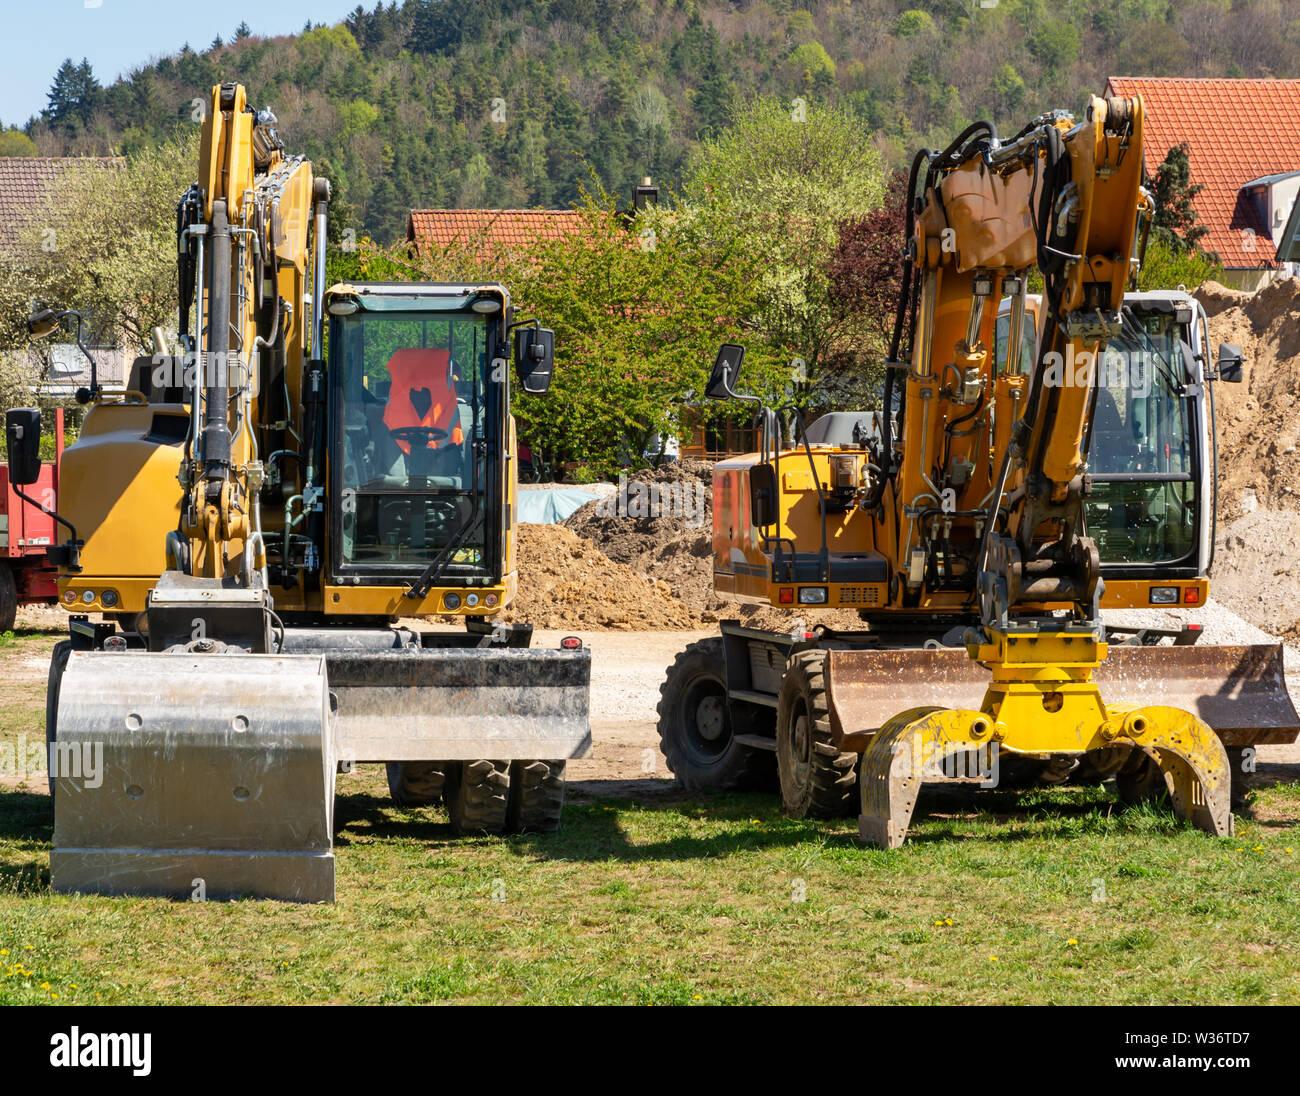 Construction site with yellow excavators - Stock Image